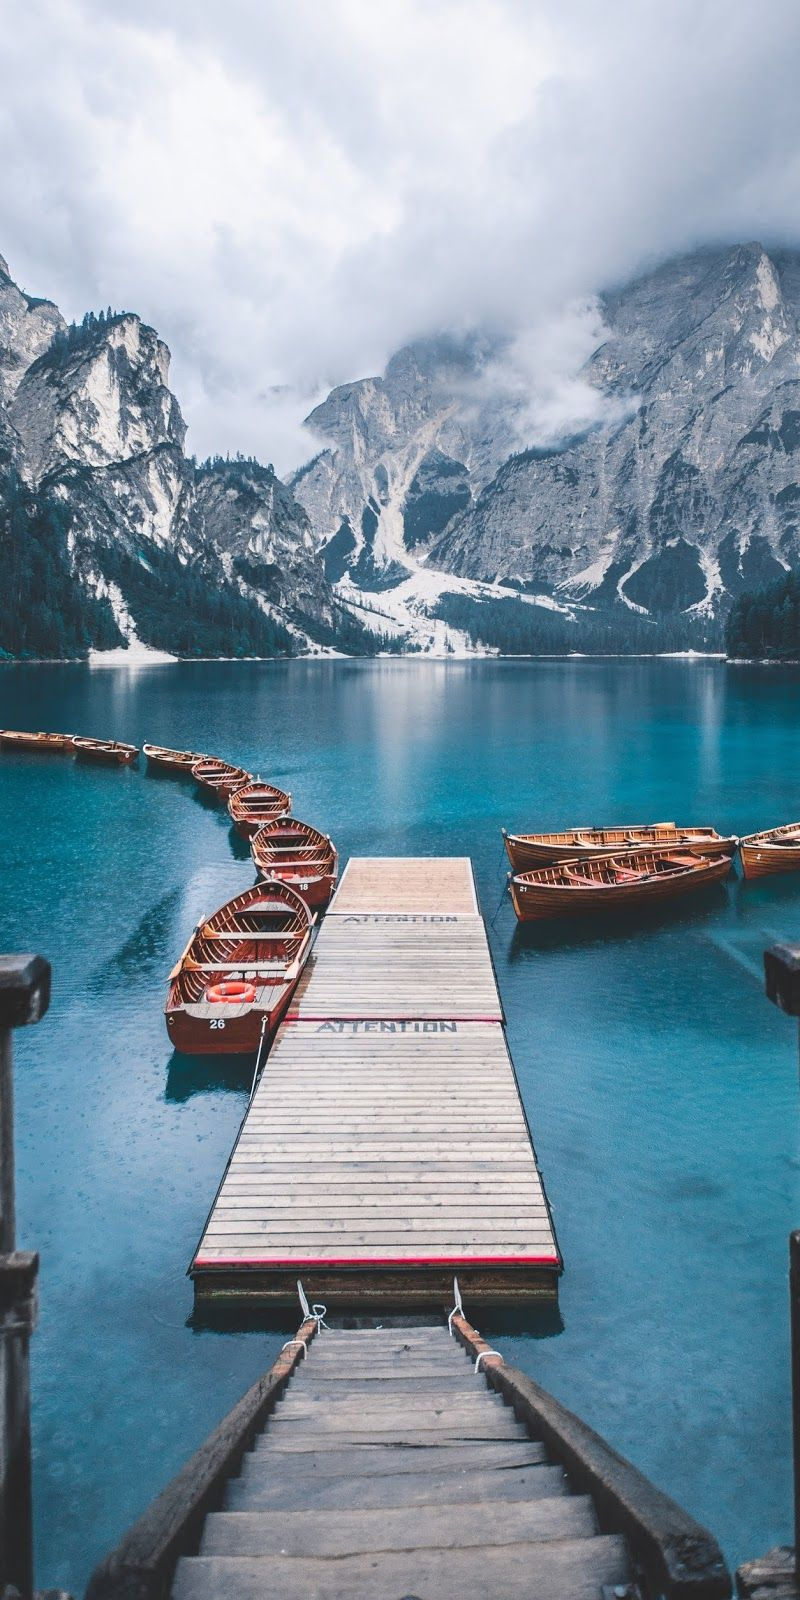 Blue lake Insta Ocean wallpaper, Decent wallpapers